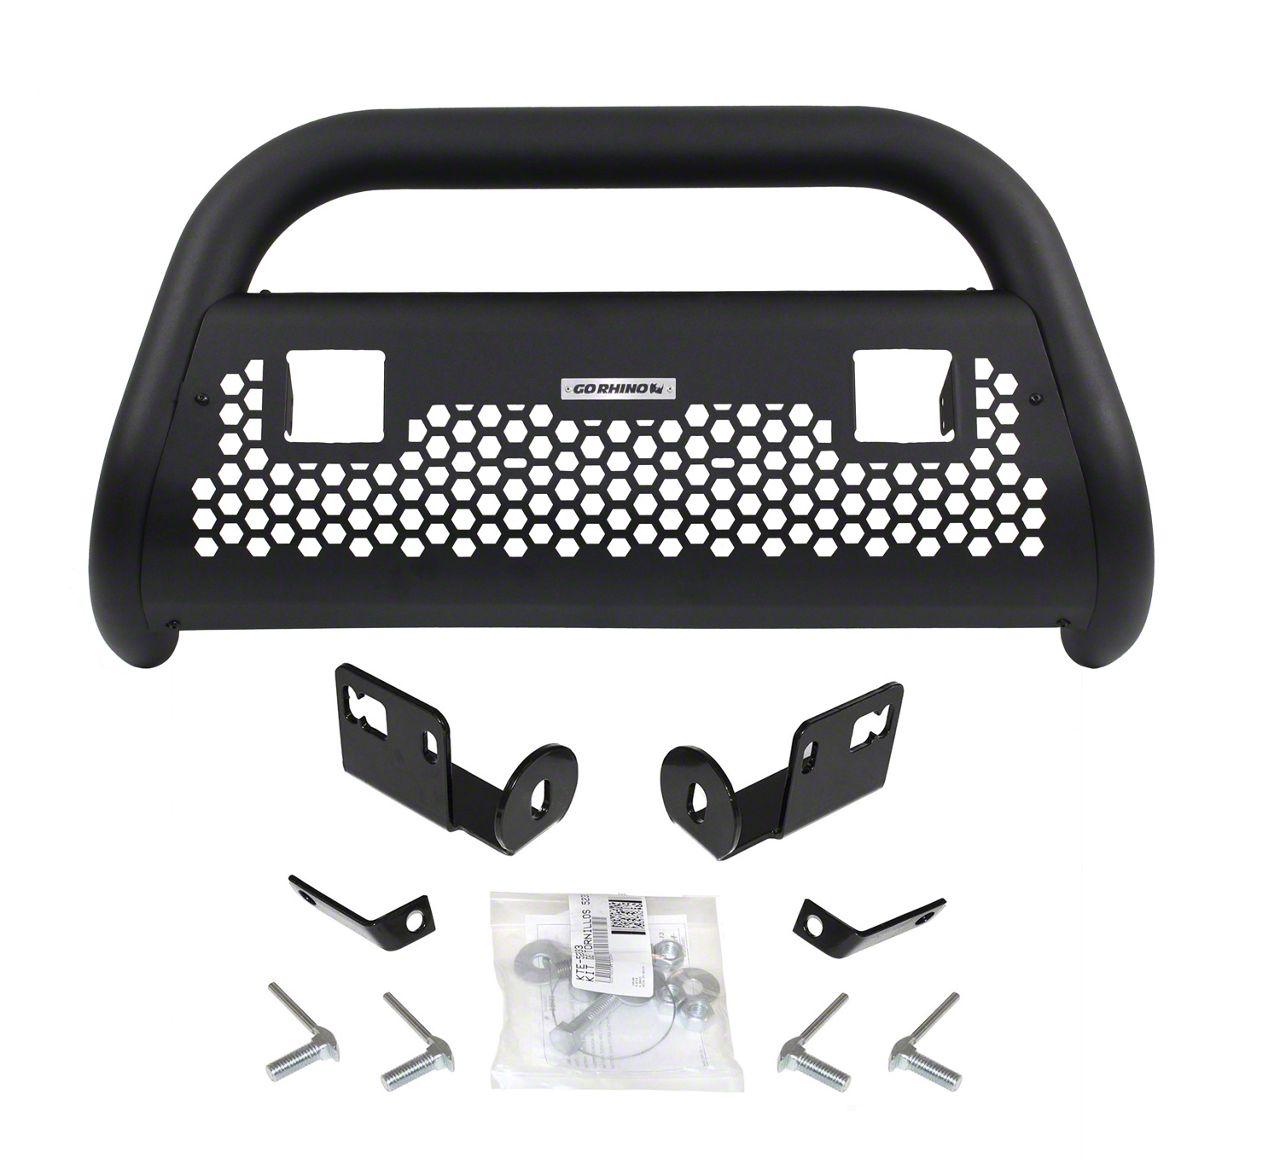 Go Rhino RC2 LR Bull Bar w/ Two LED Cube Light Mounting Brackets - Textured Black (16-18 Silverado 1500)